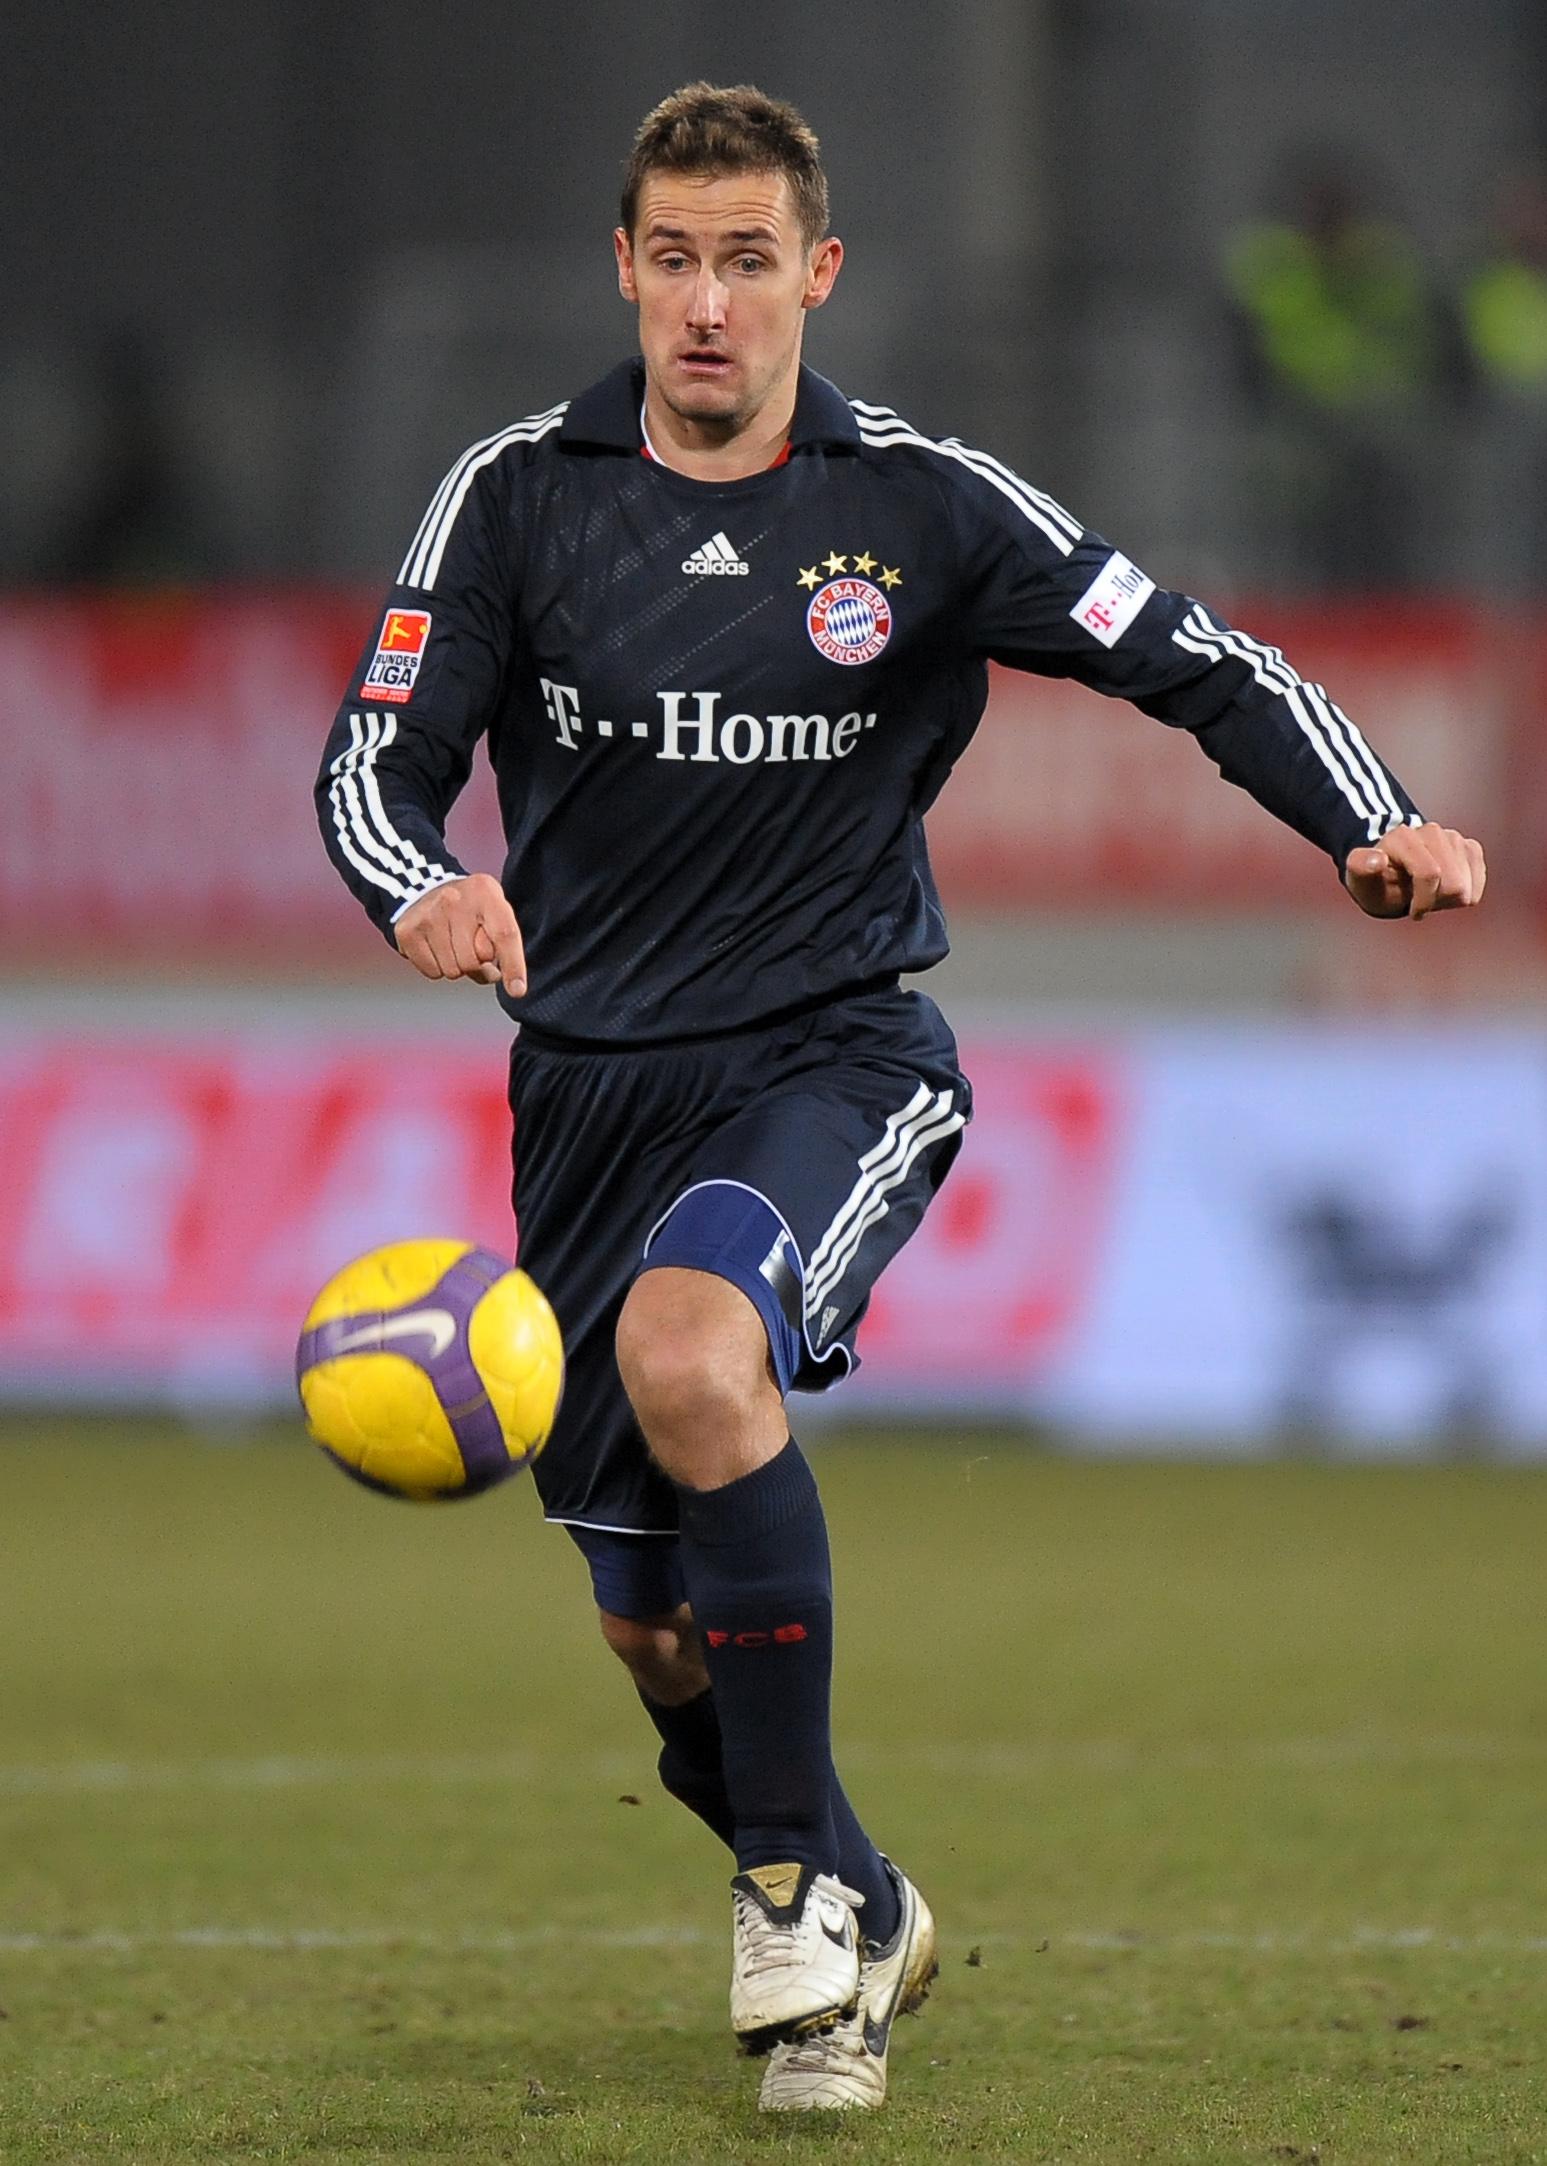 Adidas Bayern München Trikot 18 Miroslav Miro Klose 201011